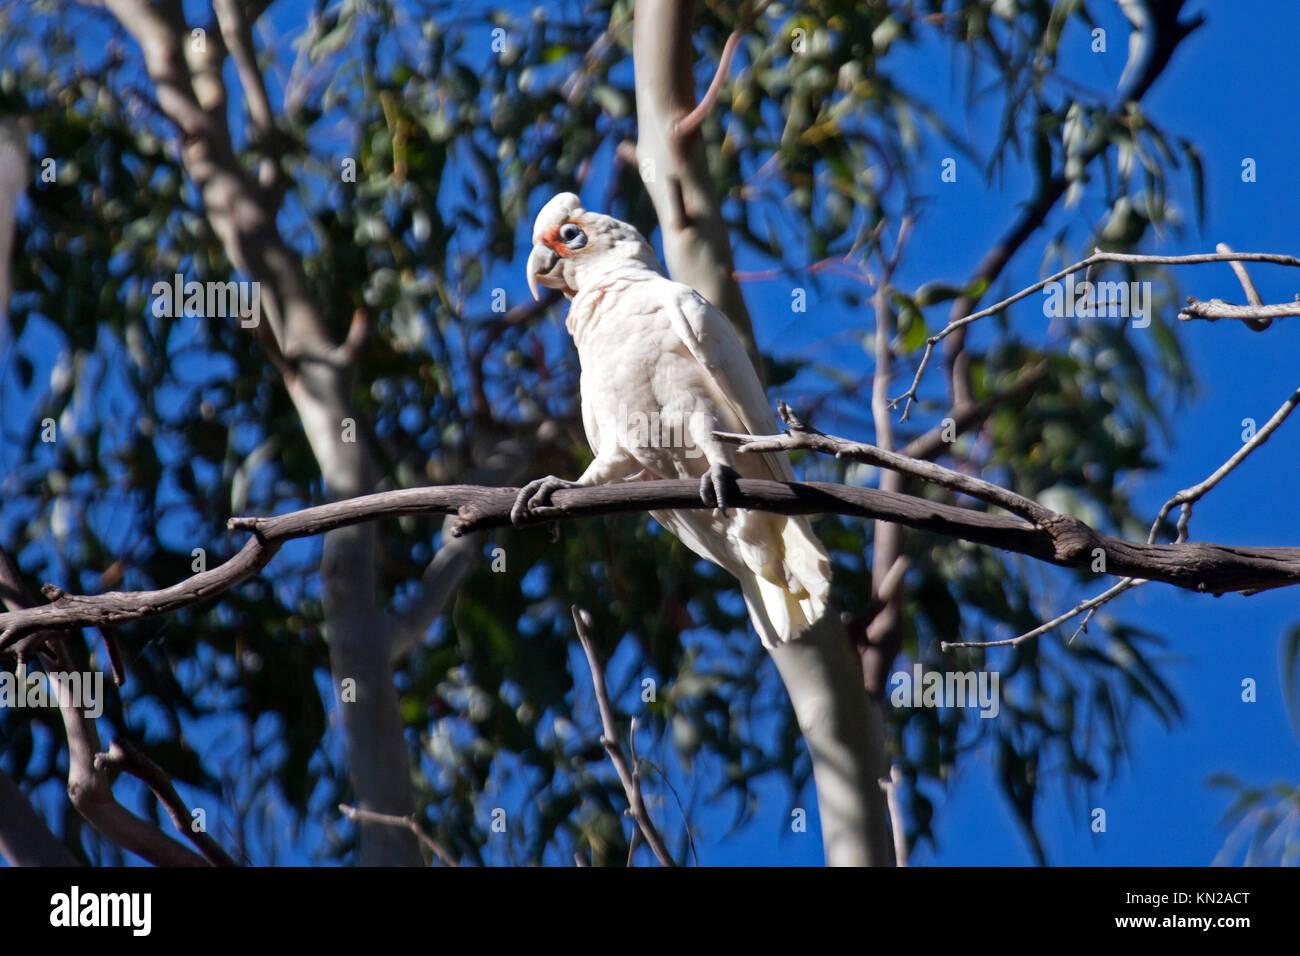 Long billed corella perched in tree in Halls Gap Victoria Australia - Stock Image